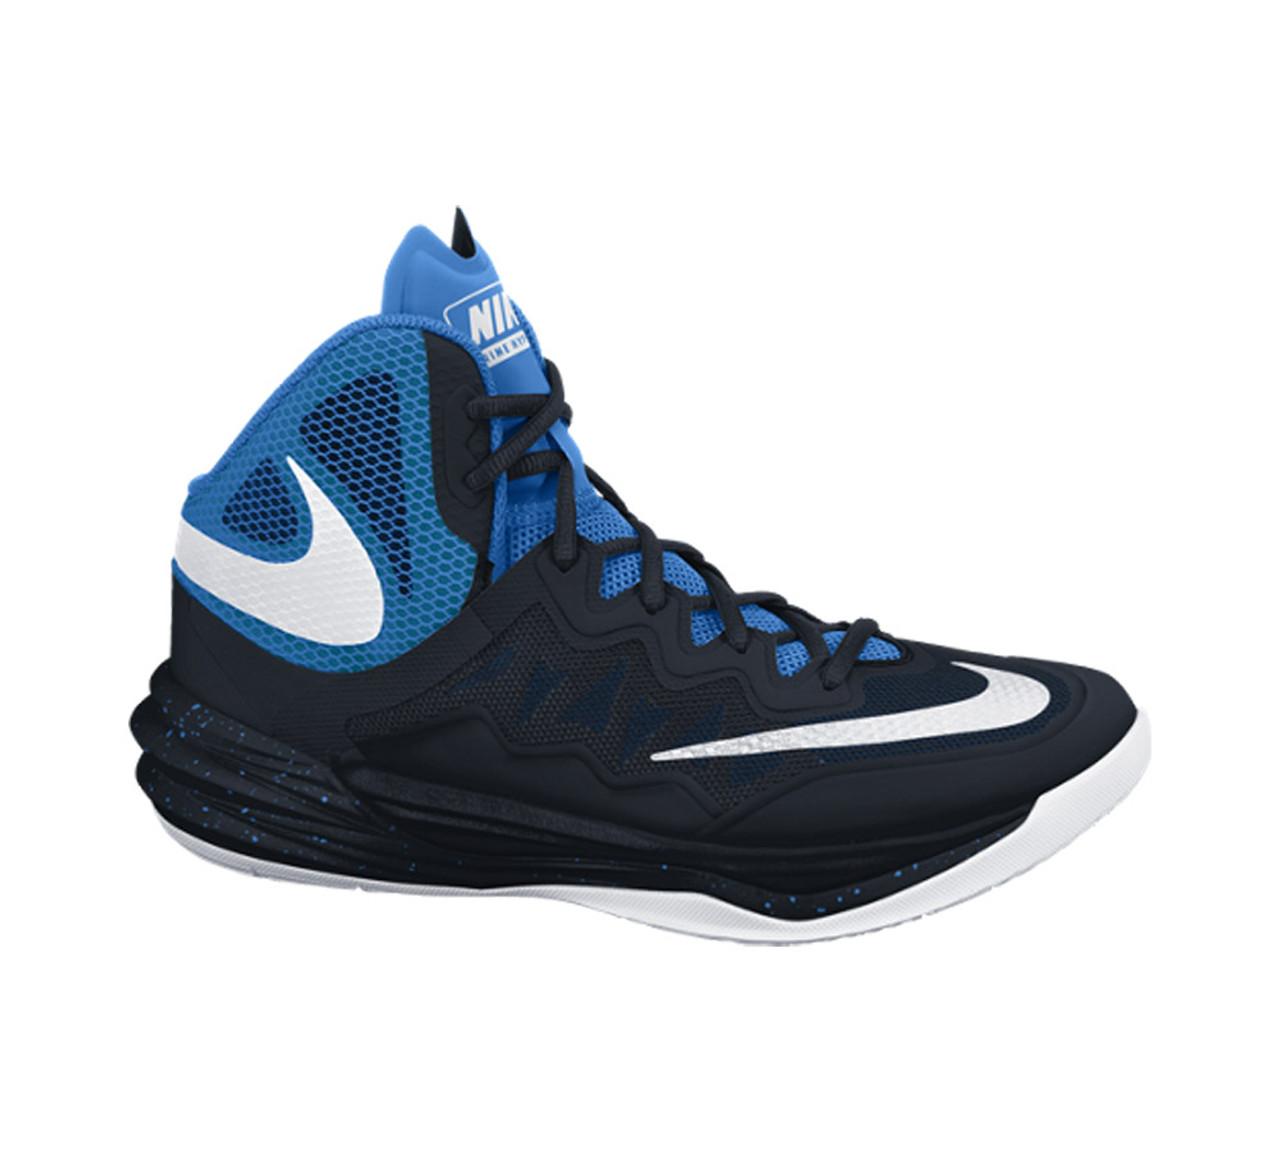 new arrival 98aec dad51 Nike Men's Prime Hype DF II Basketball Shoe Black/Blue